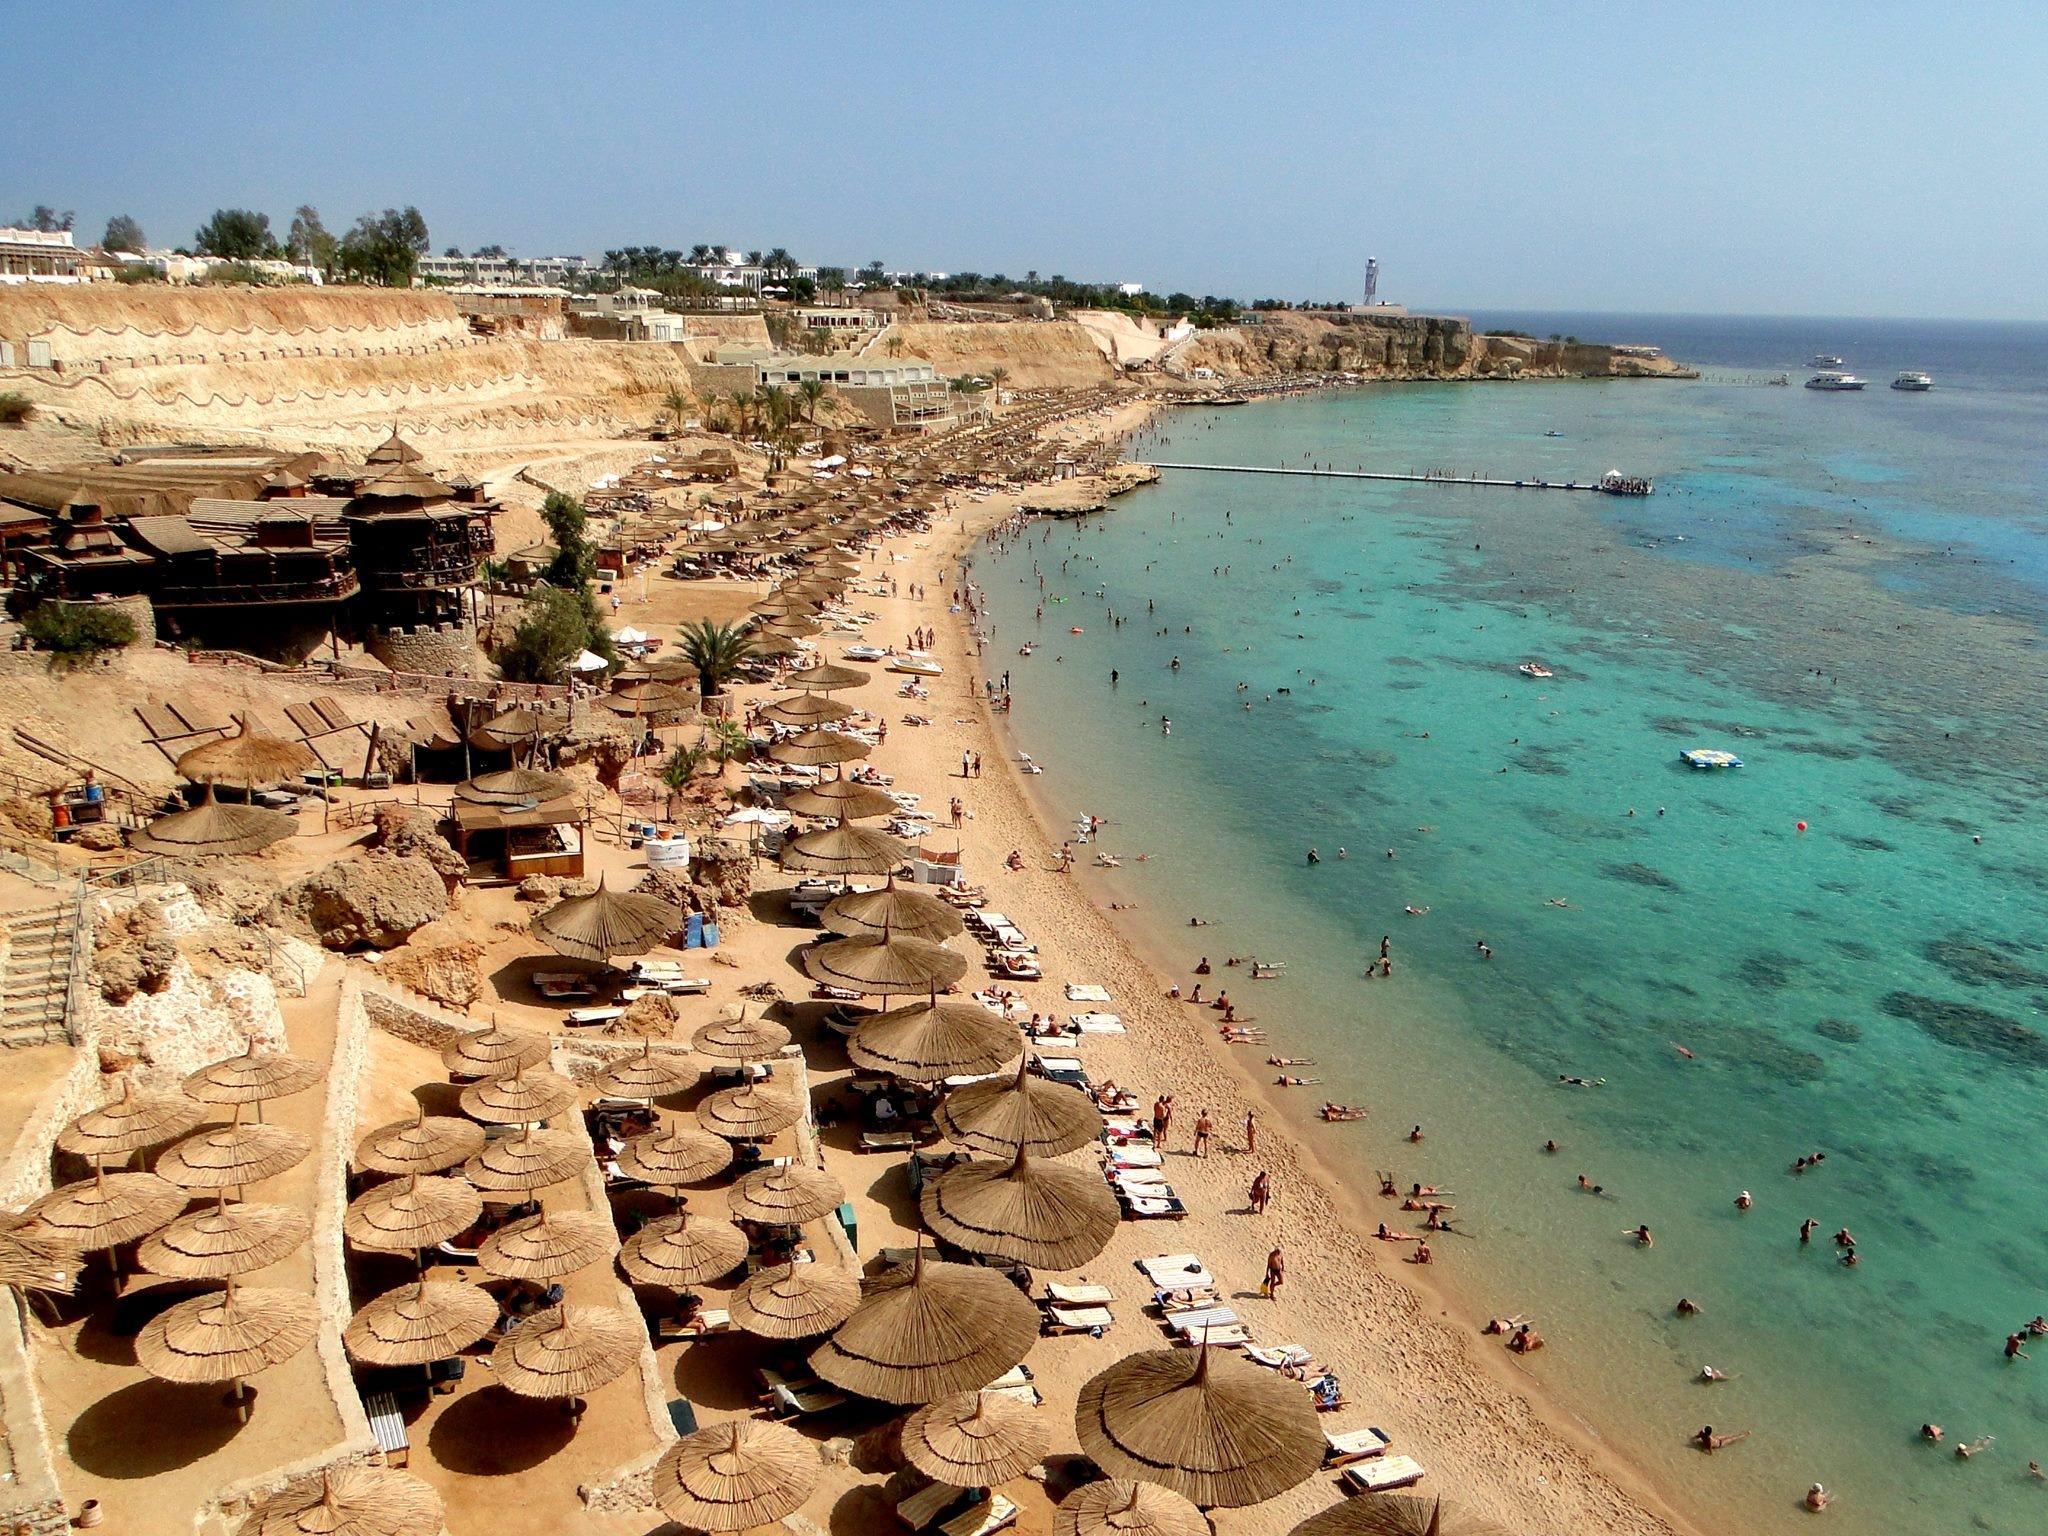 Welecome to Egypt.....Sharm El shaikh. by Ashraf Younis